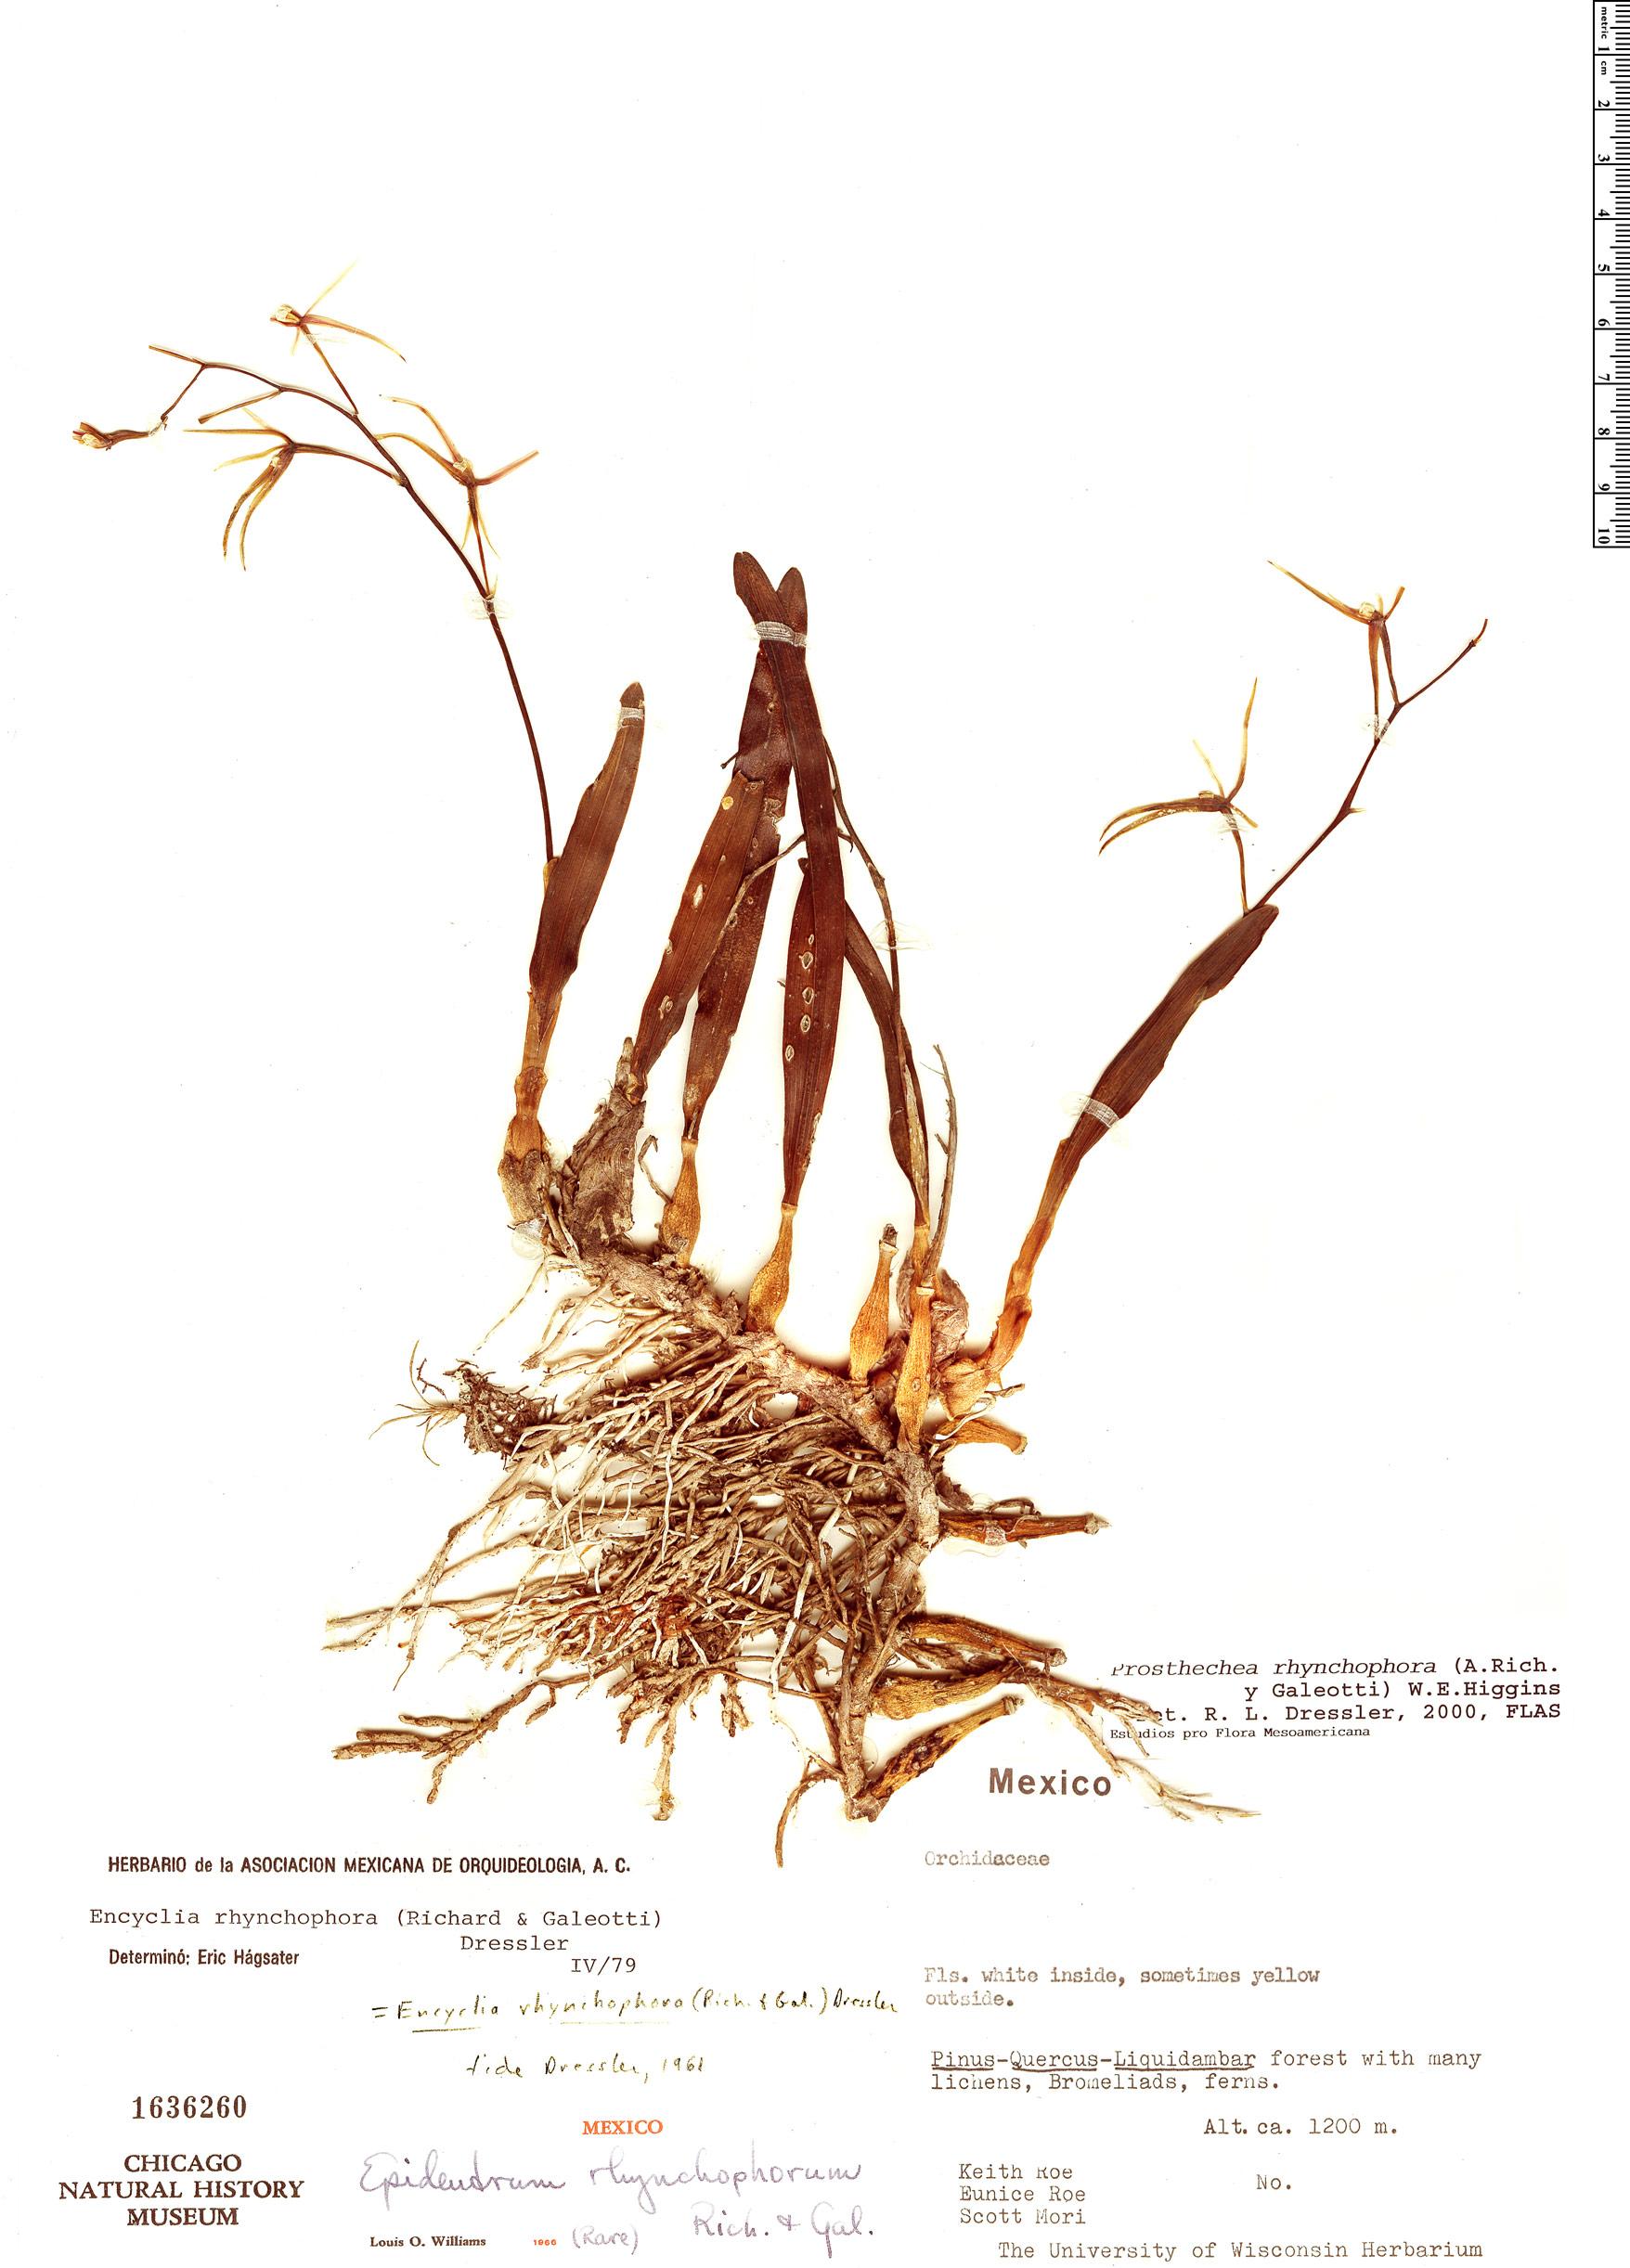 Specimen: Prosthechea rhynchophora